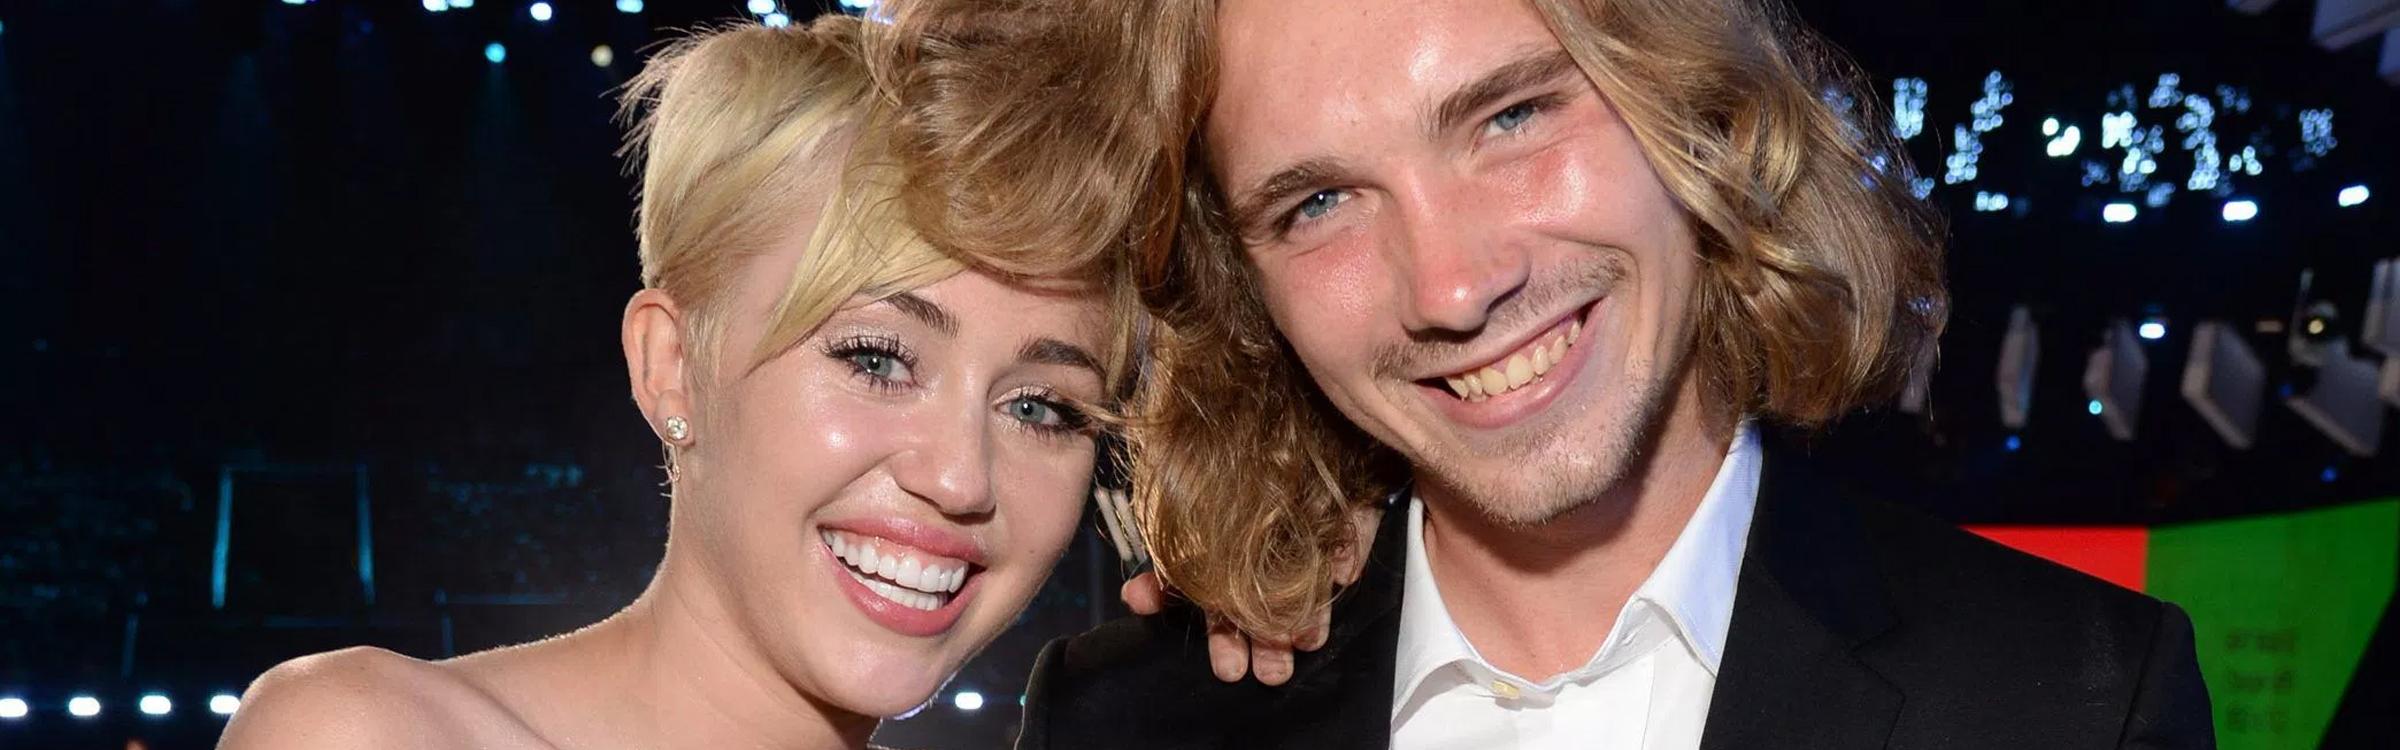 Miley hobo header